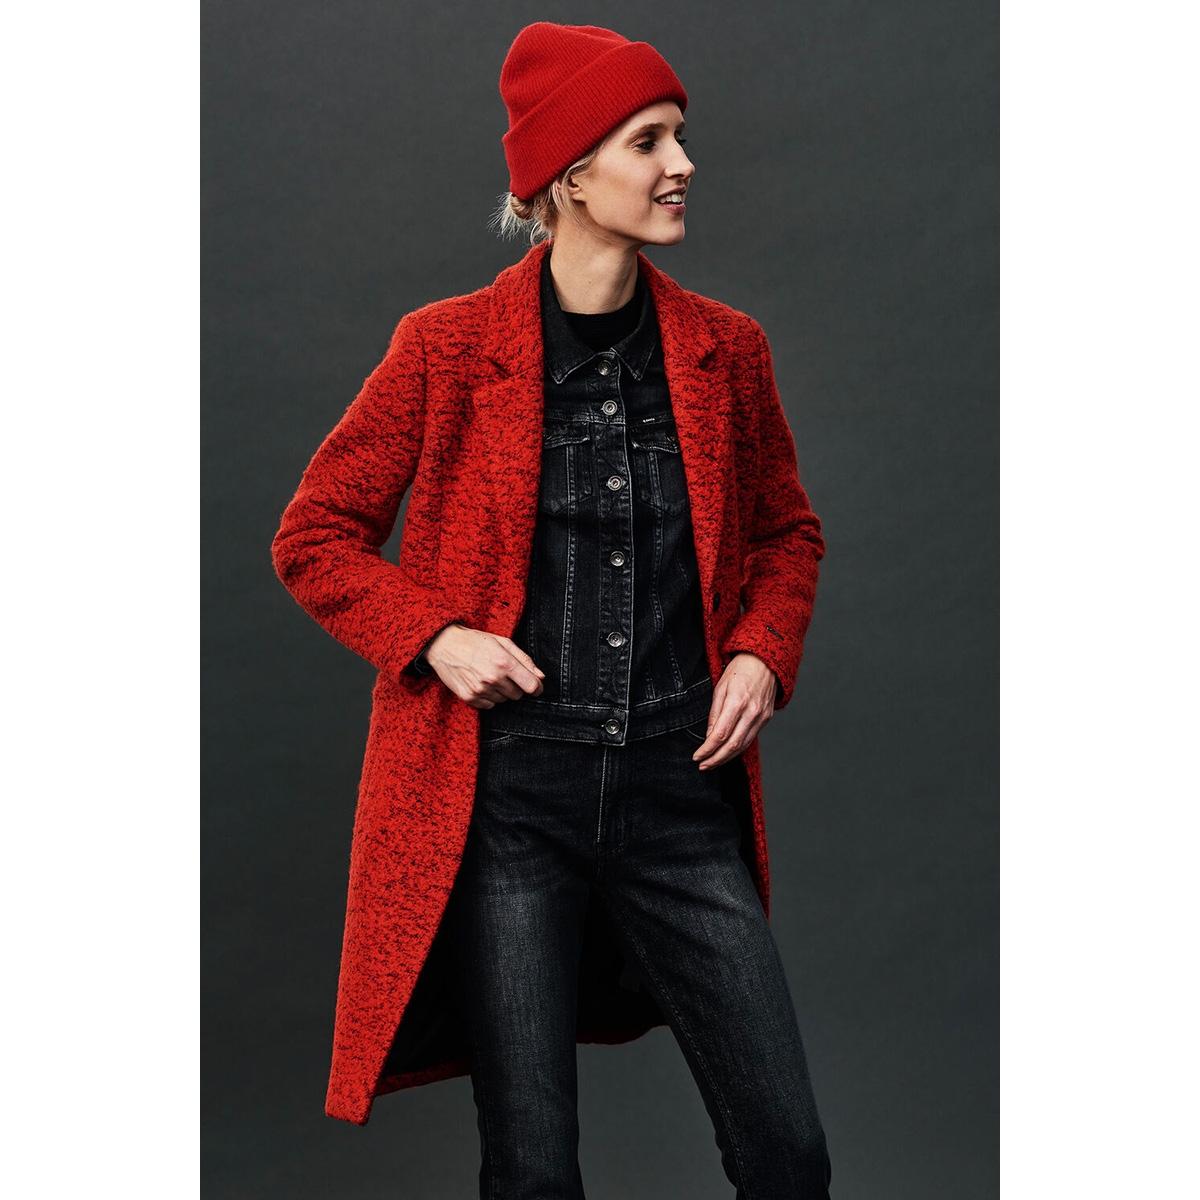 manteljas gj900913 garcia jas 2045 fiery red